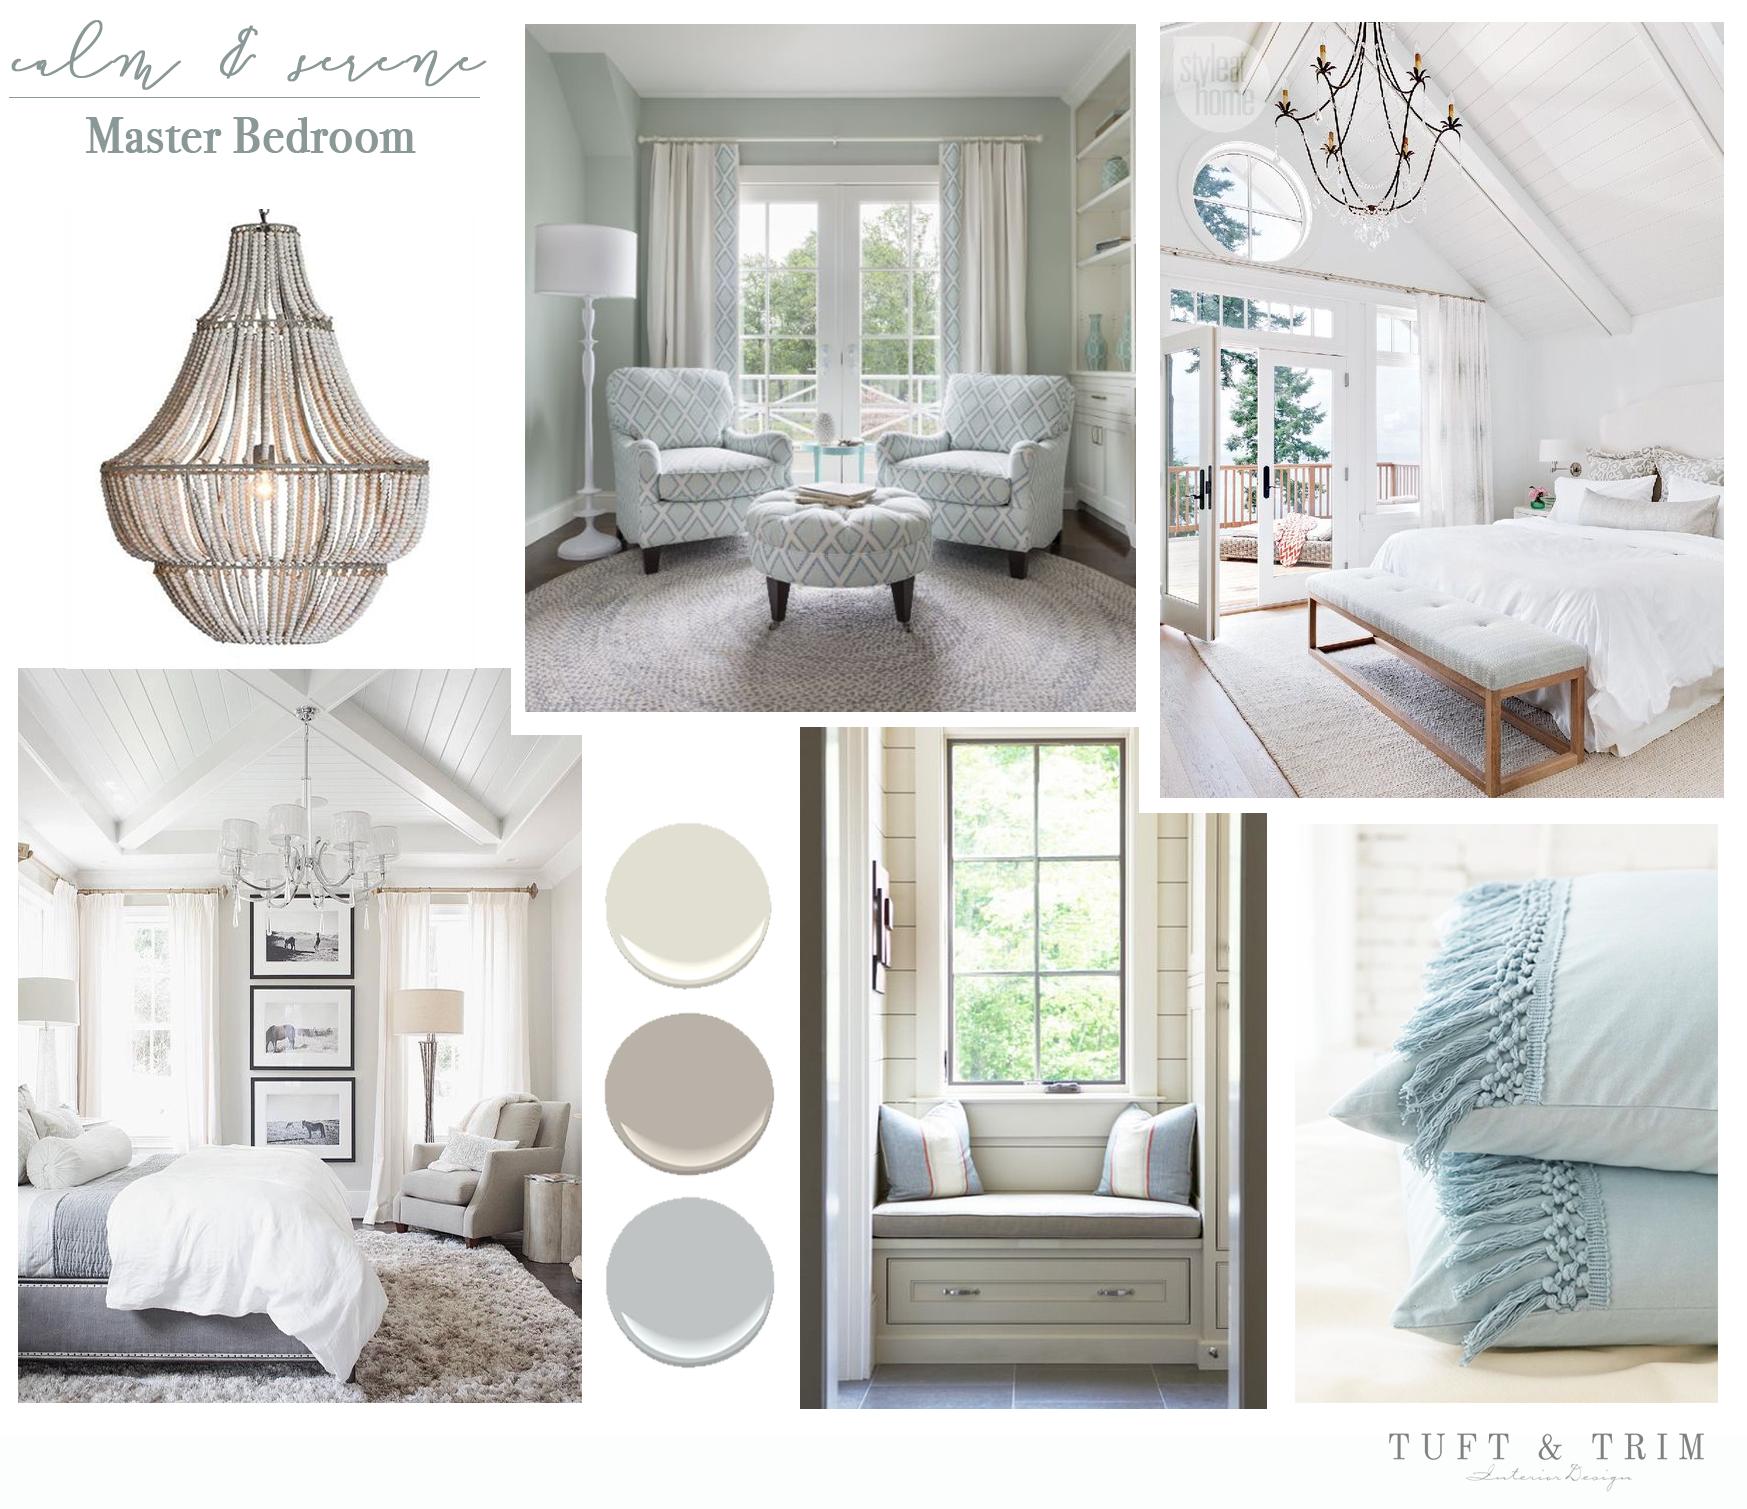 Design Concept Calm & Serene Bedroom